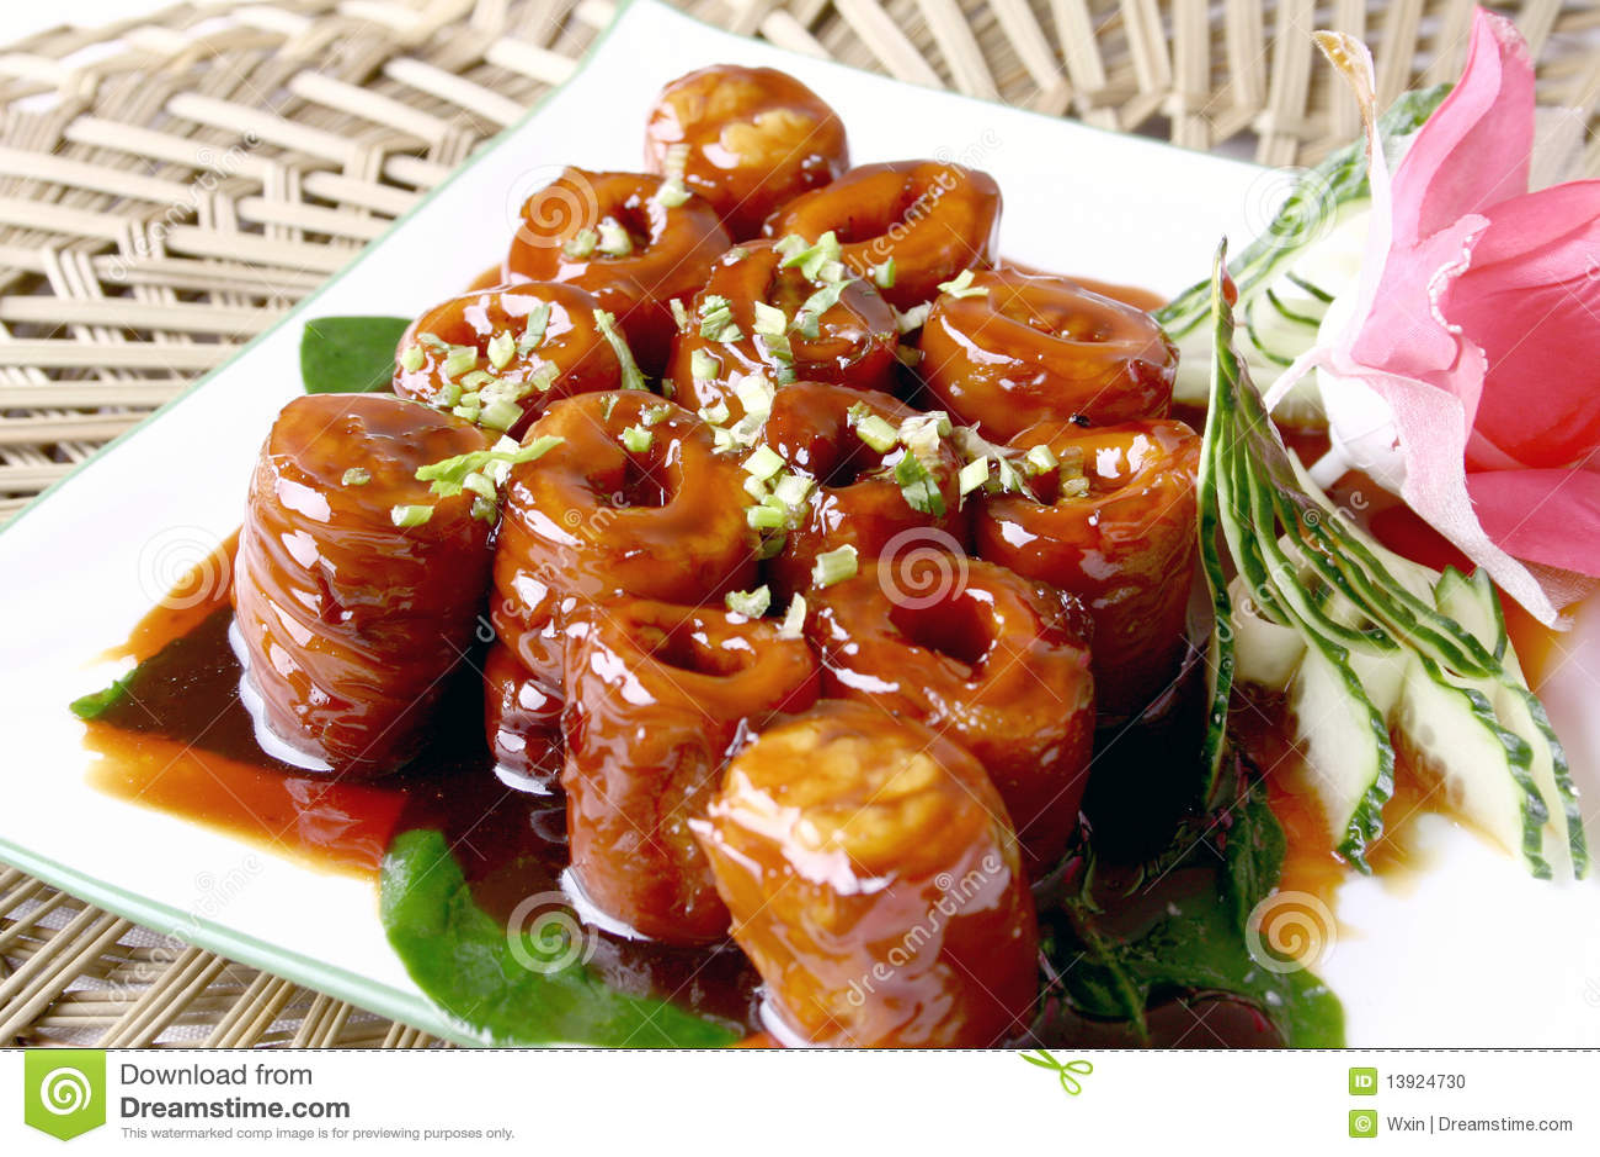 Pig Intestines Chinese Food